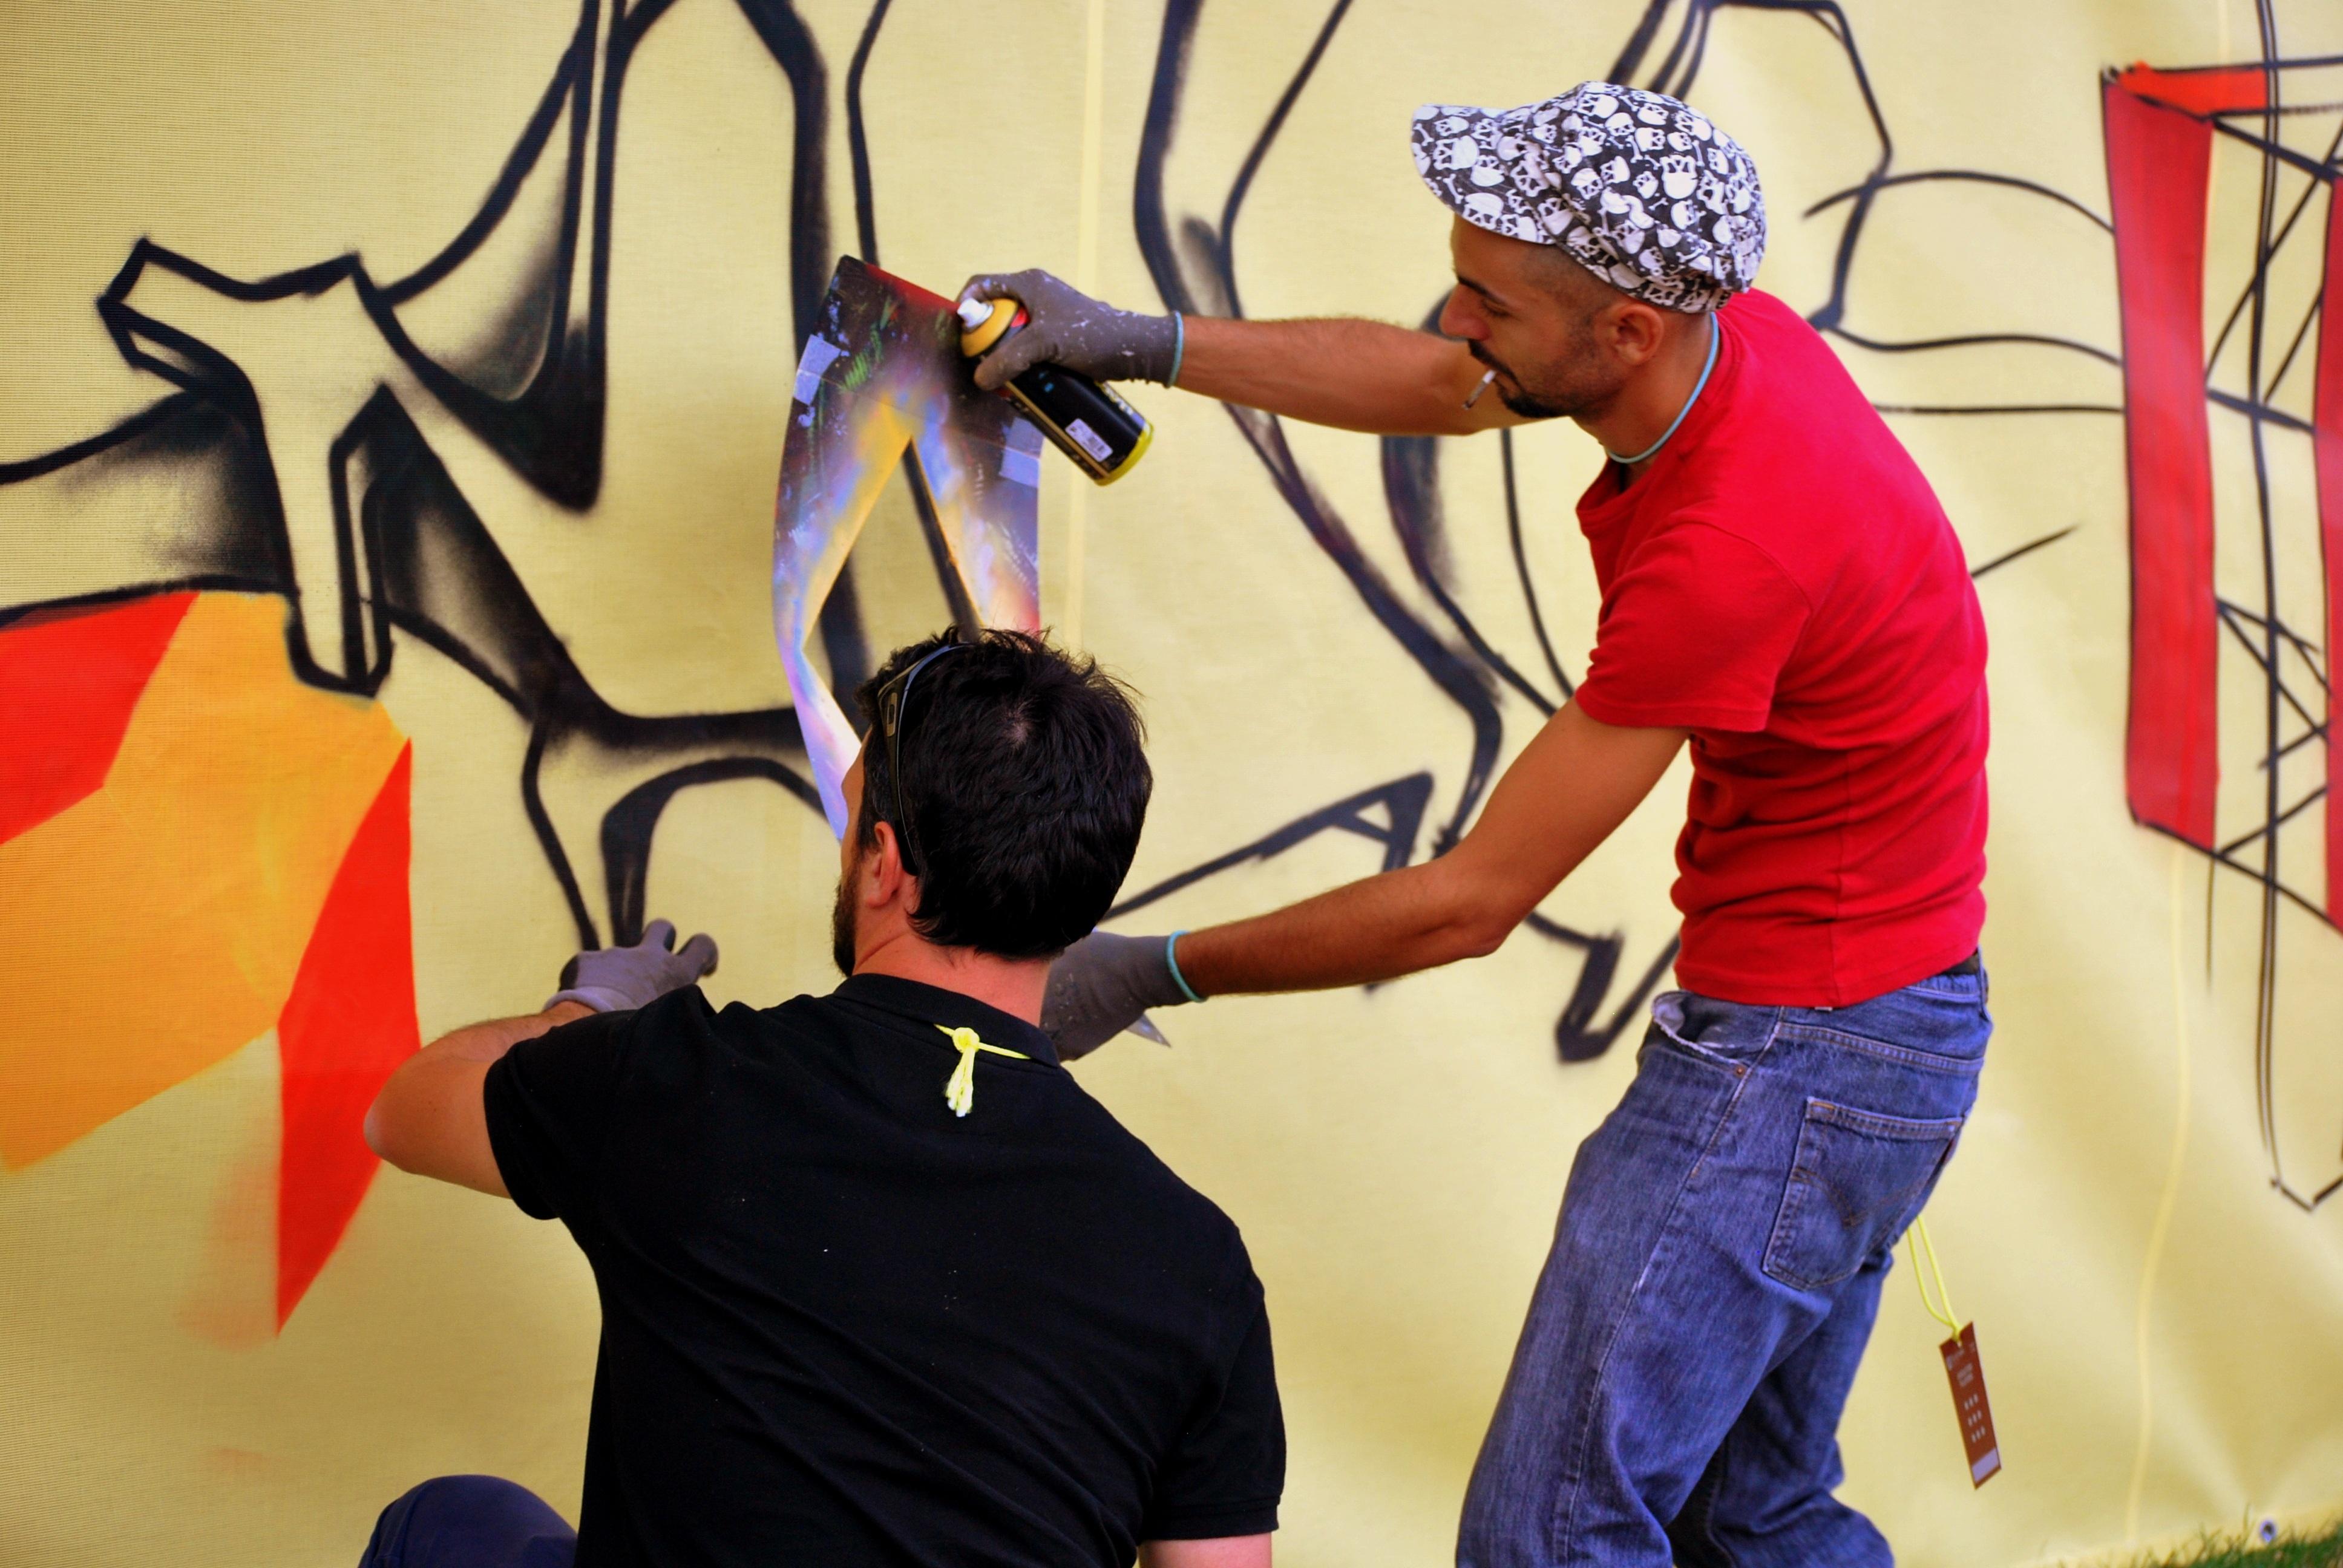 Free Fotobanka Hra Tanec Sprej Italie Grafiti Performance